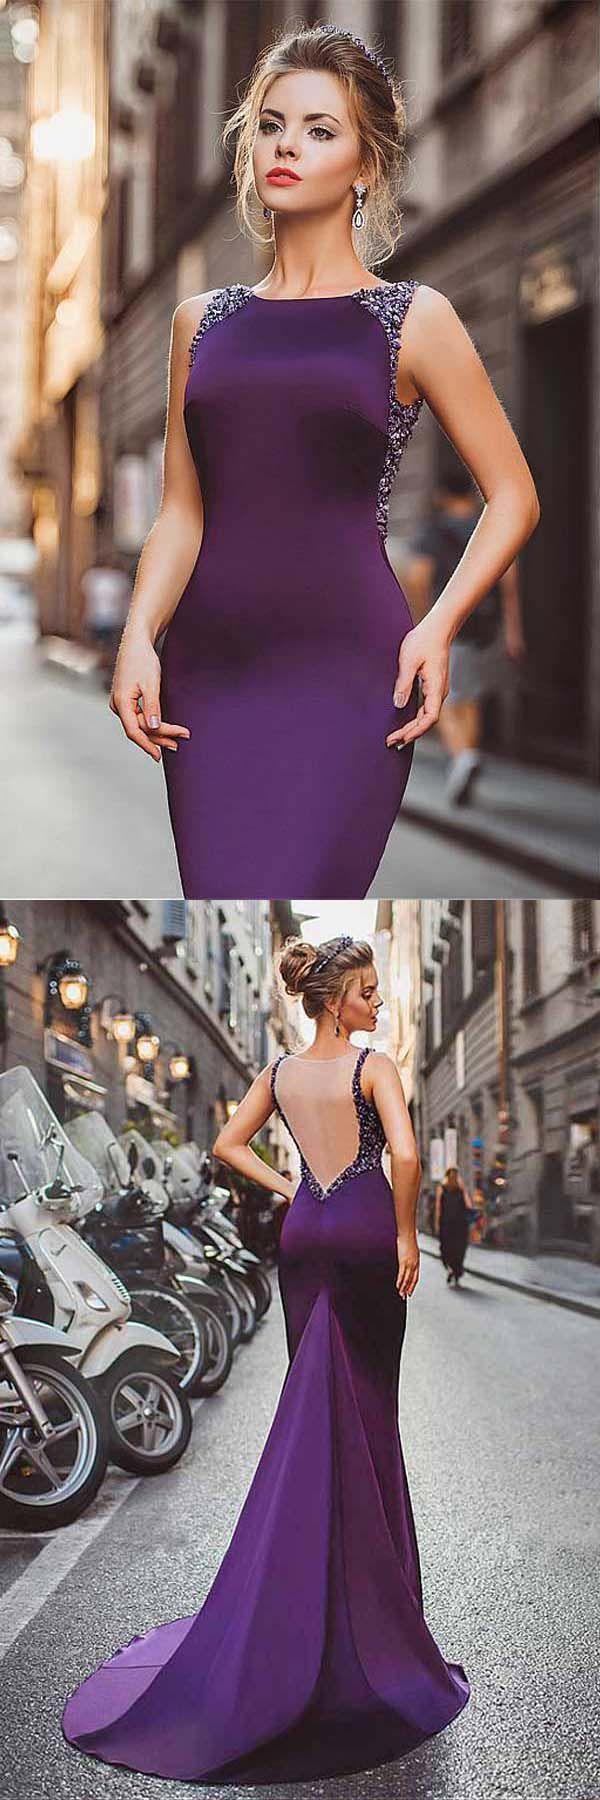 Neckline Satin Purple Mermaid Evening Dress